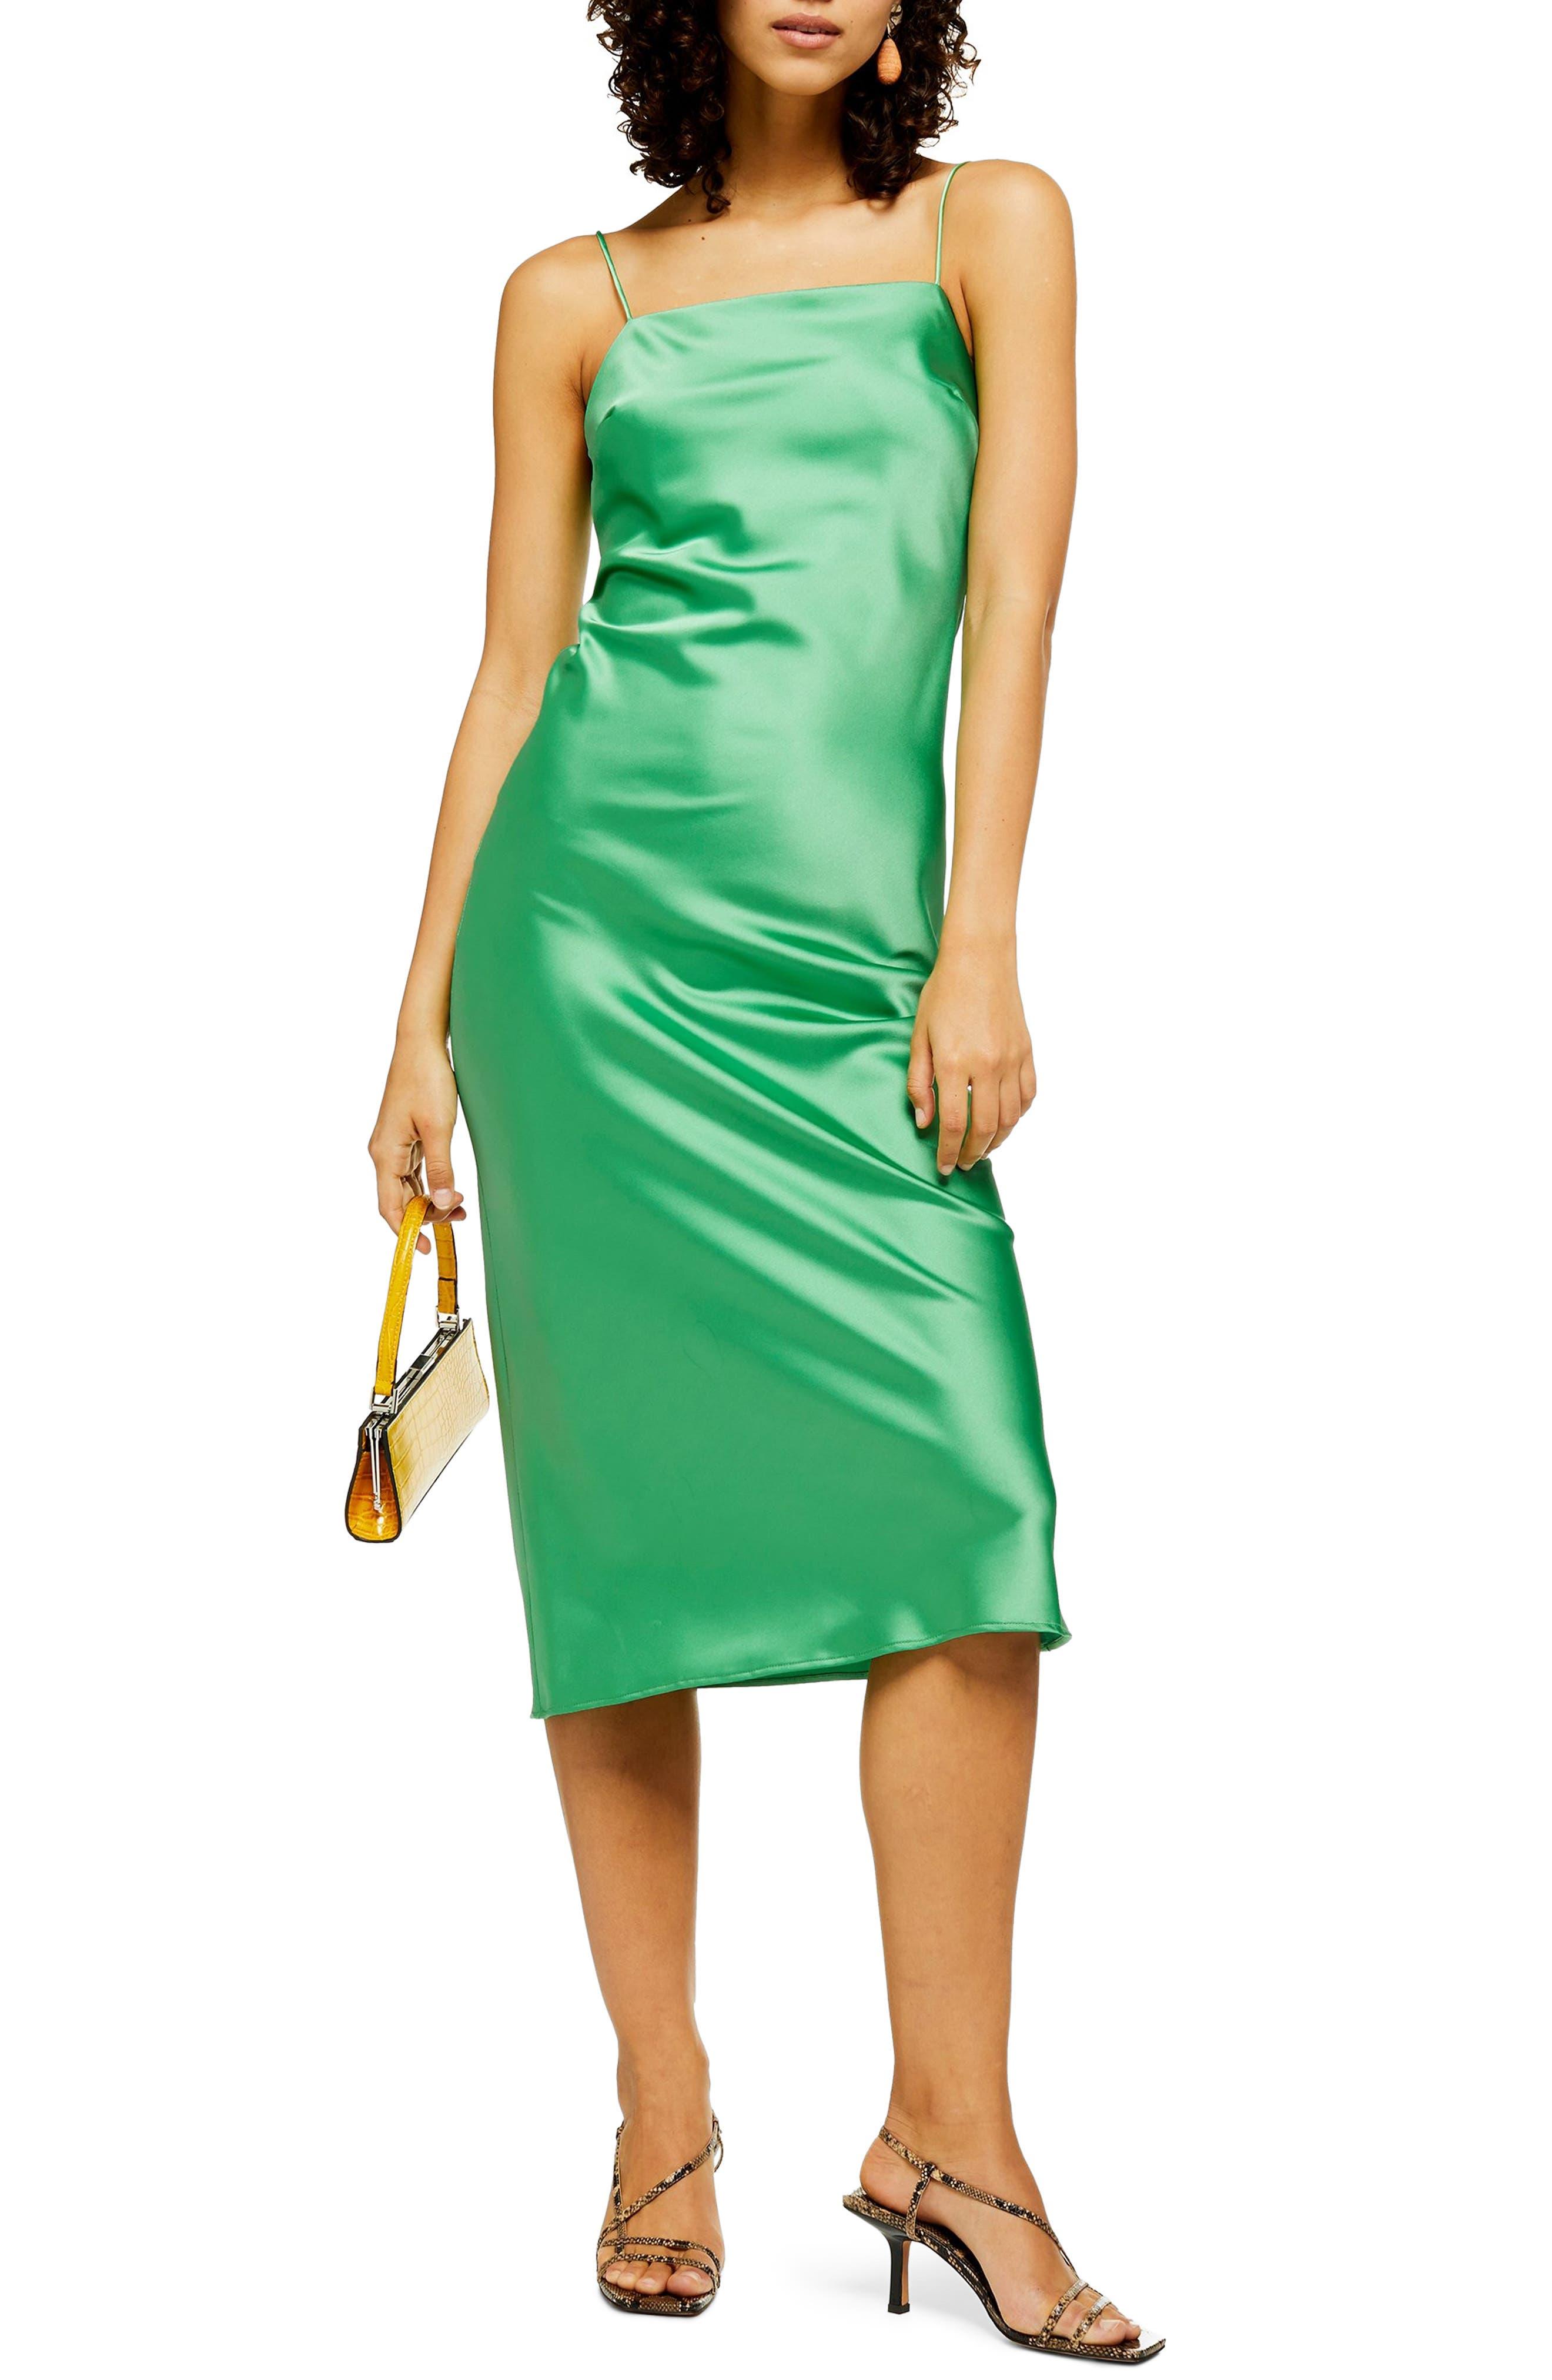 Topshop Square Neck Slipdress, US (fits like 0) - Green